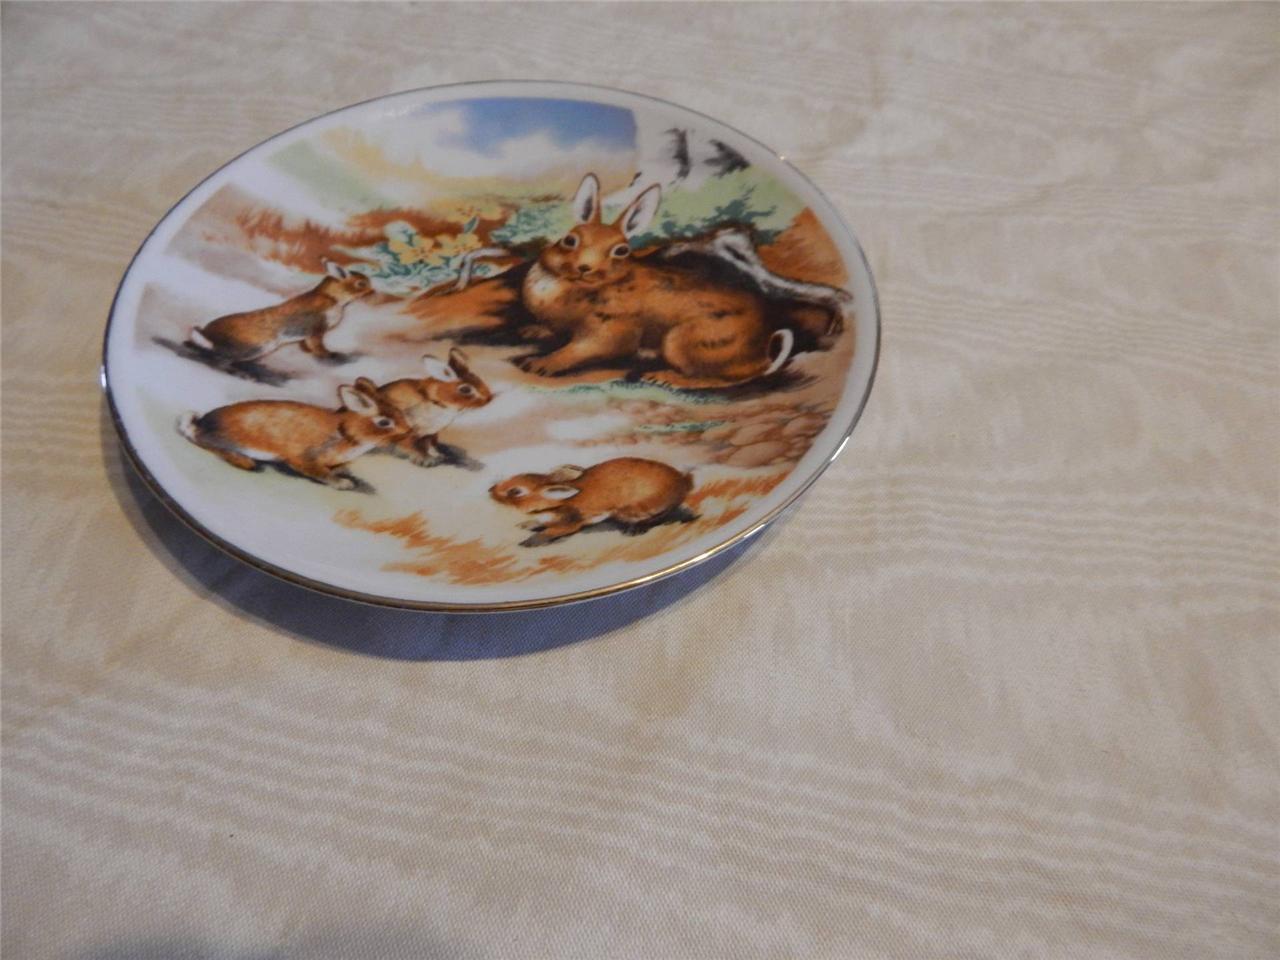 "BUNNY EASTER 8"" PLATE BRITISH WILDLIFE COLLECTION Gold Gild Edge EUC"